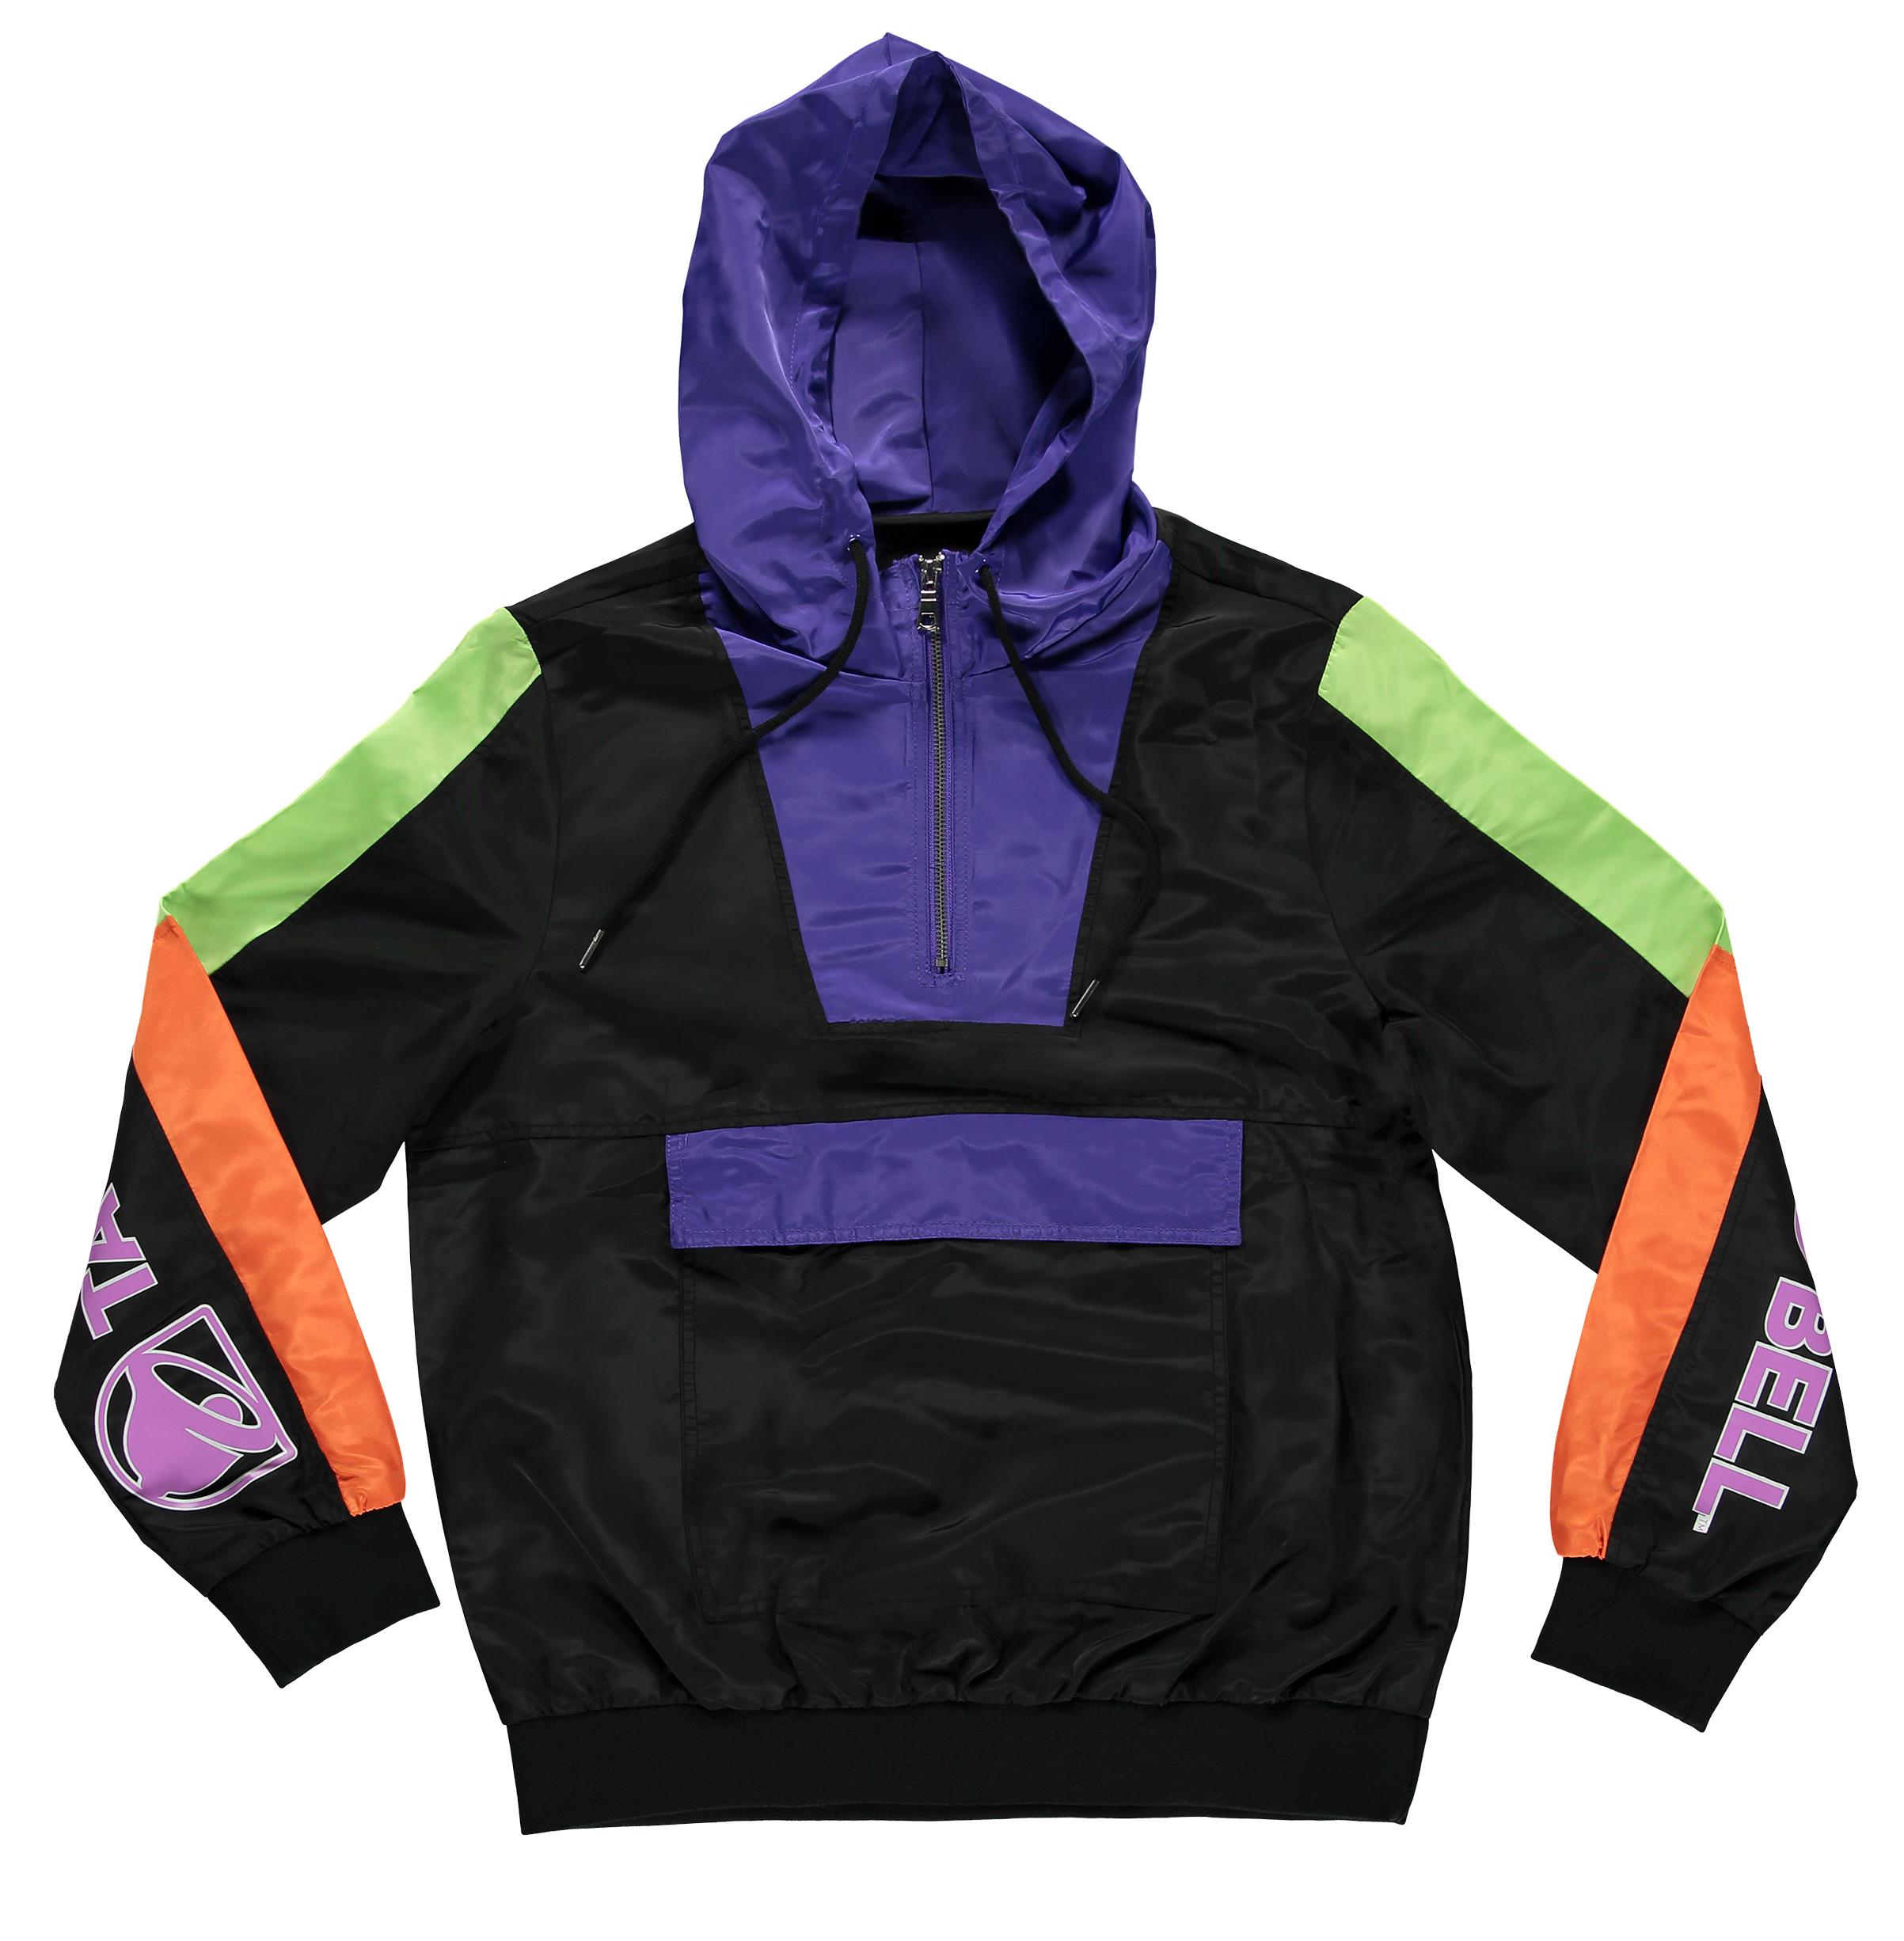 Taco Bell Anorak Jacket